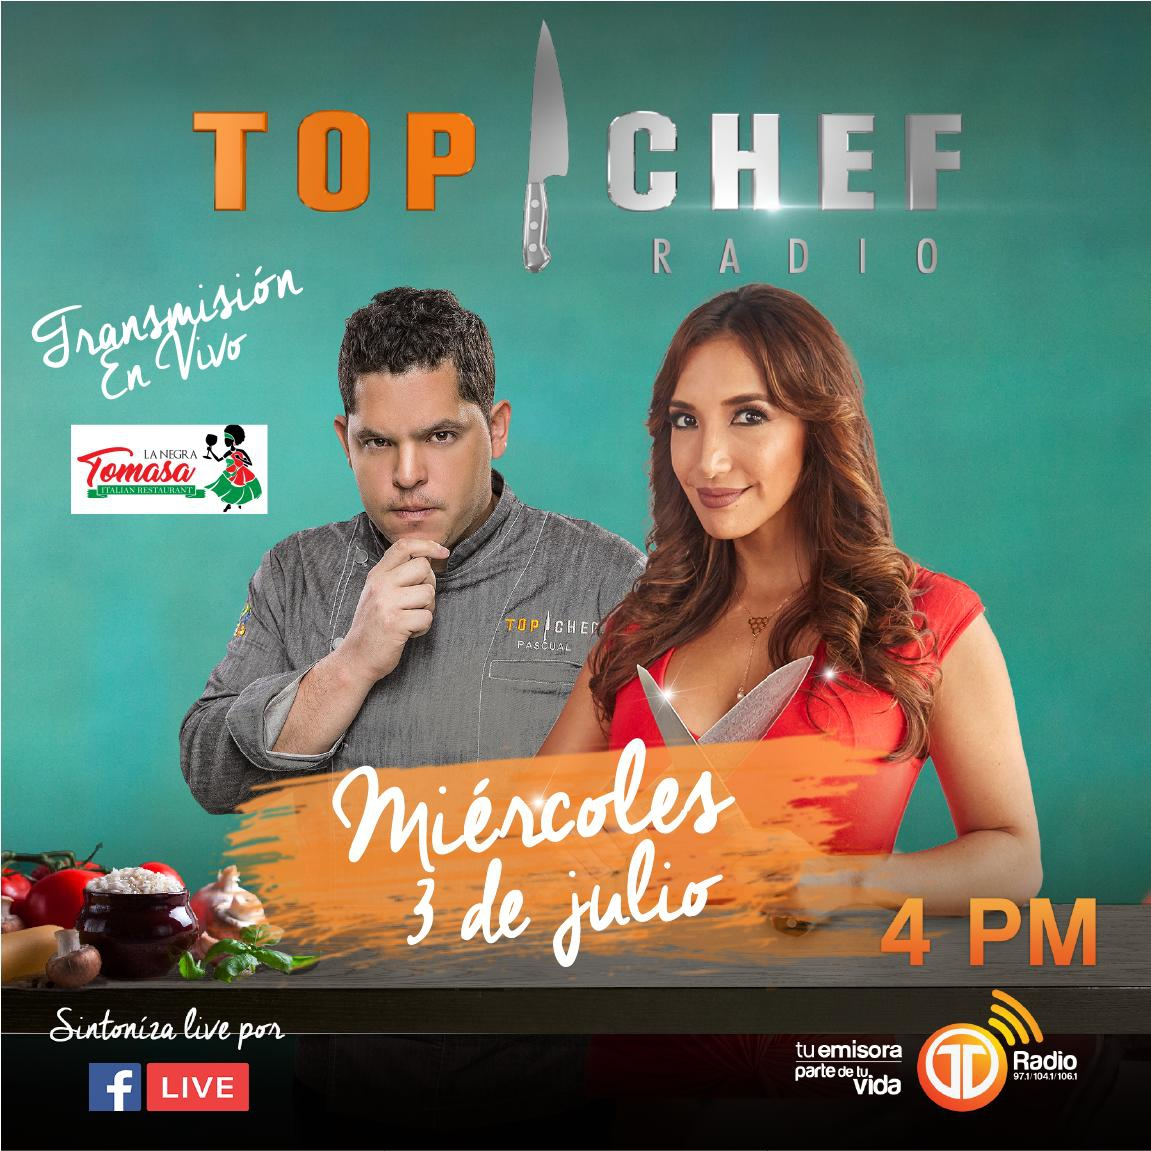 Top Chef Radio